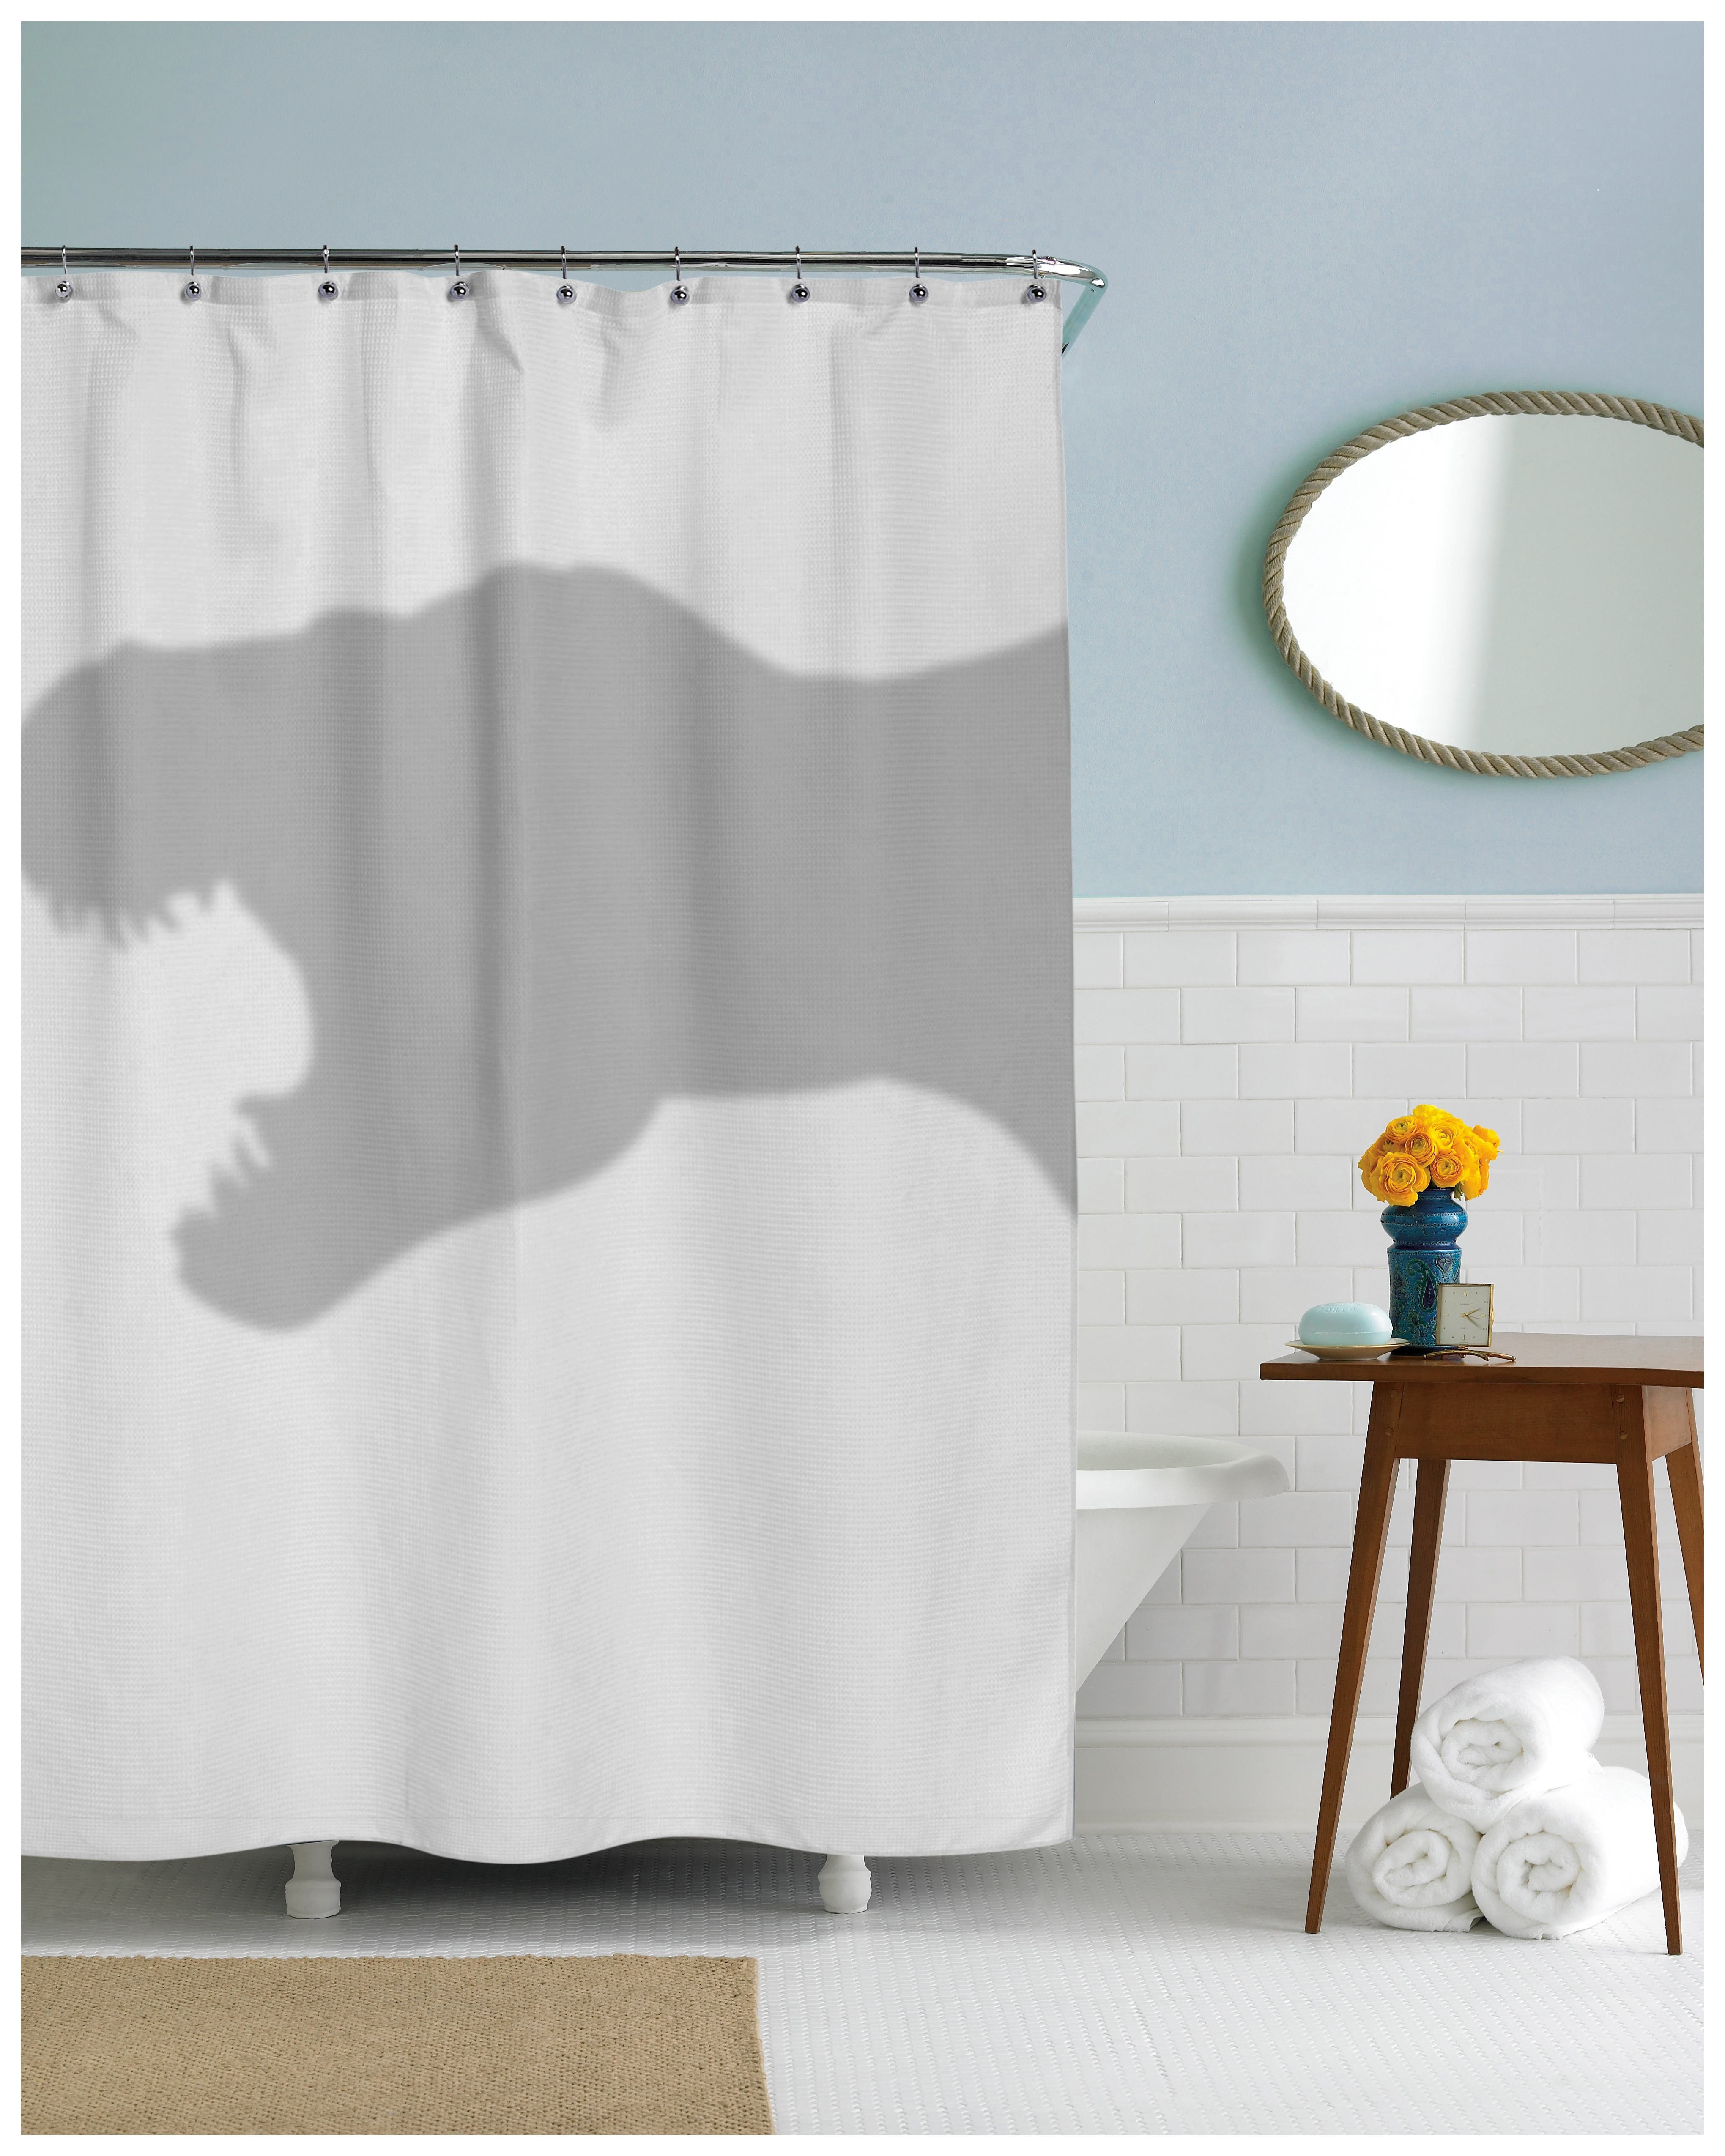 T Rex Shower Curtain | Dinosaur Shower Curtain